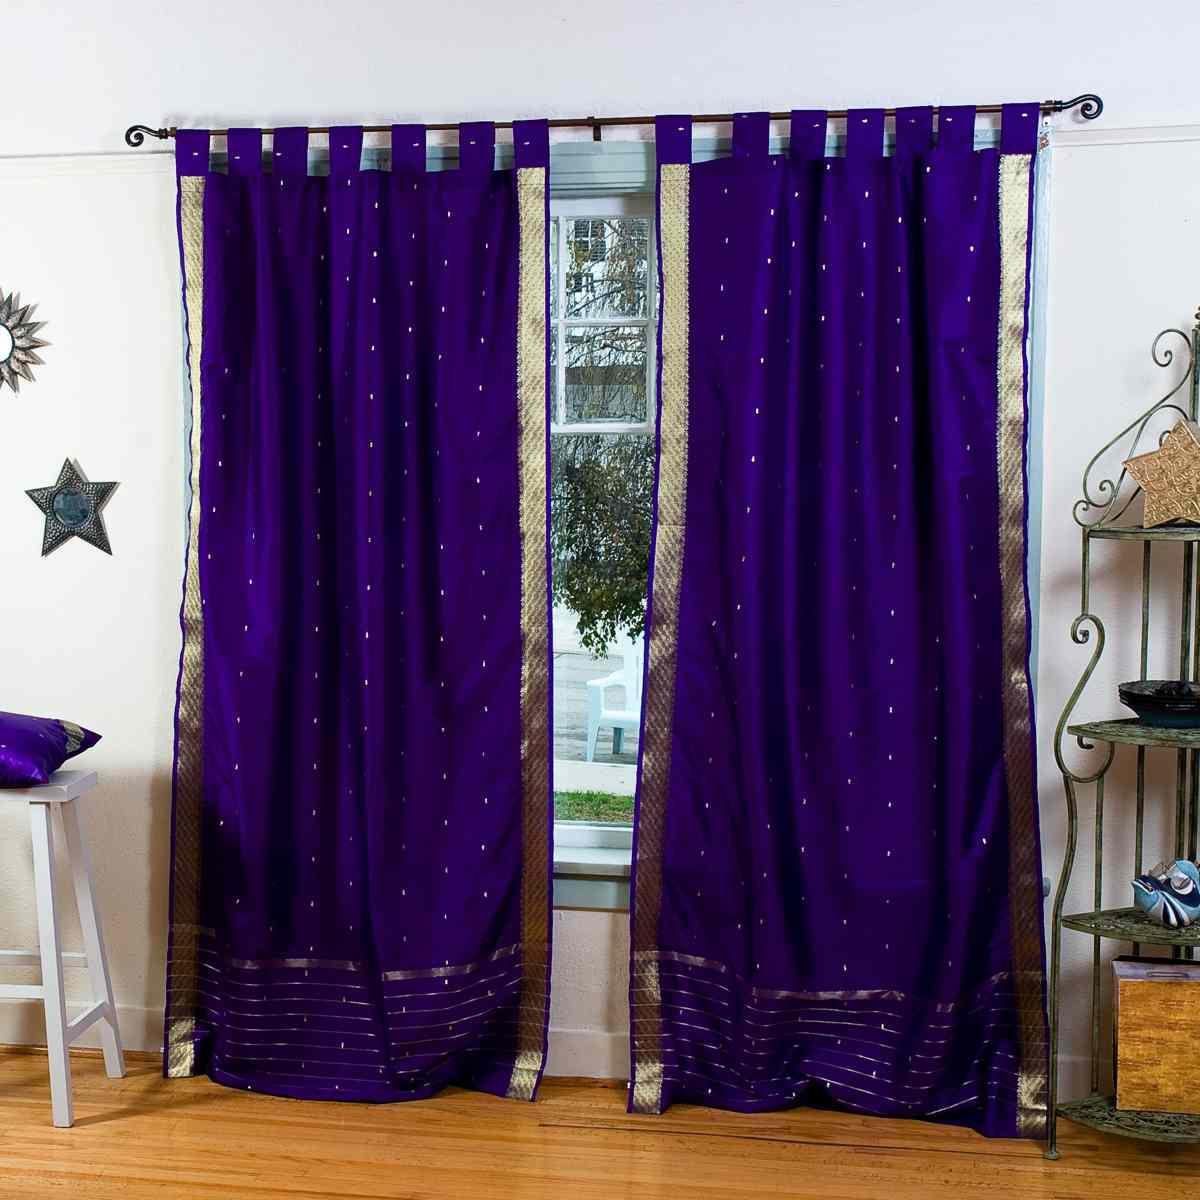 Indian Selections Purple Tab Top Sheer Sari Curtain / Drape / Panel - Piece